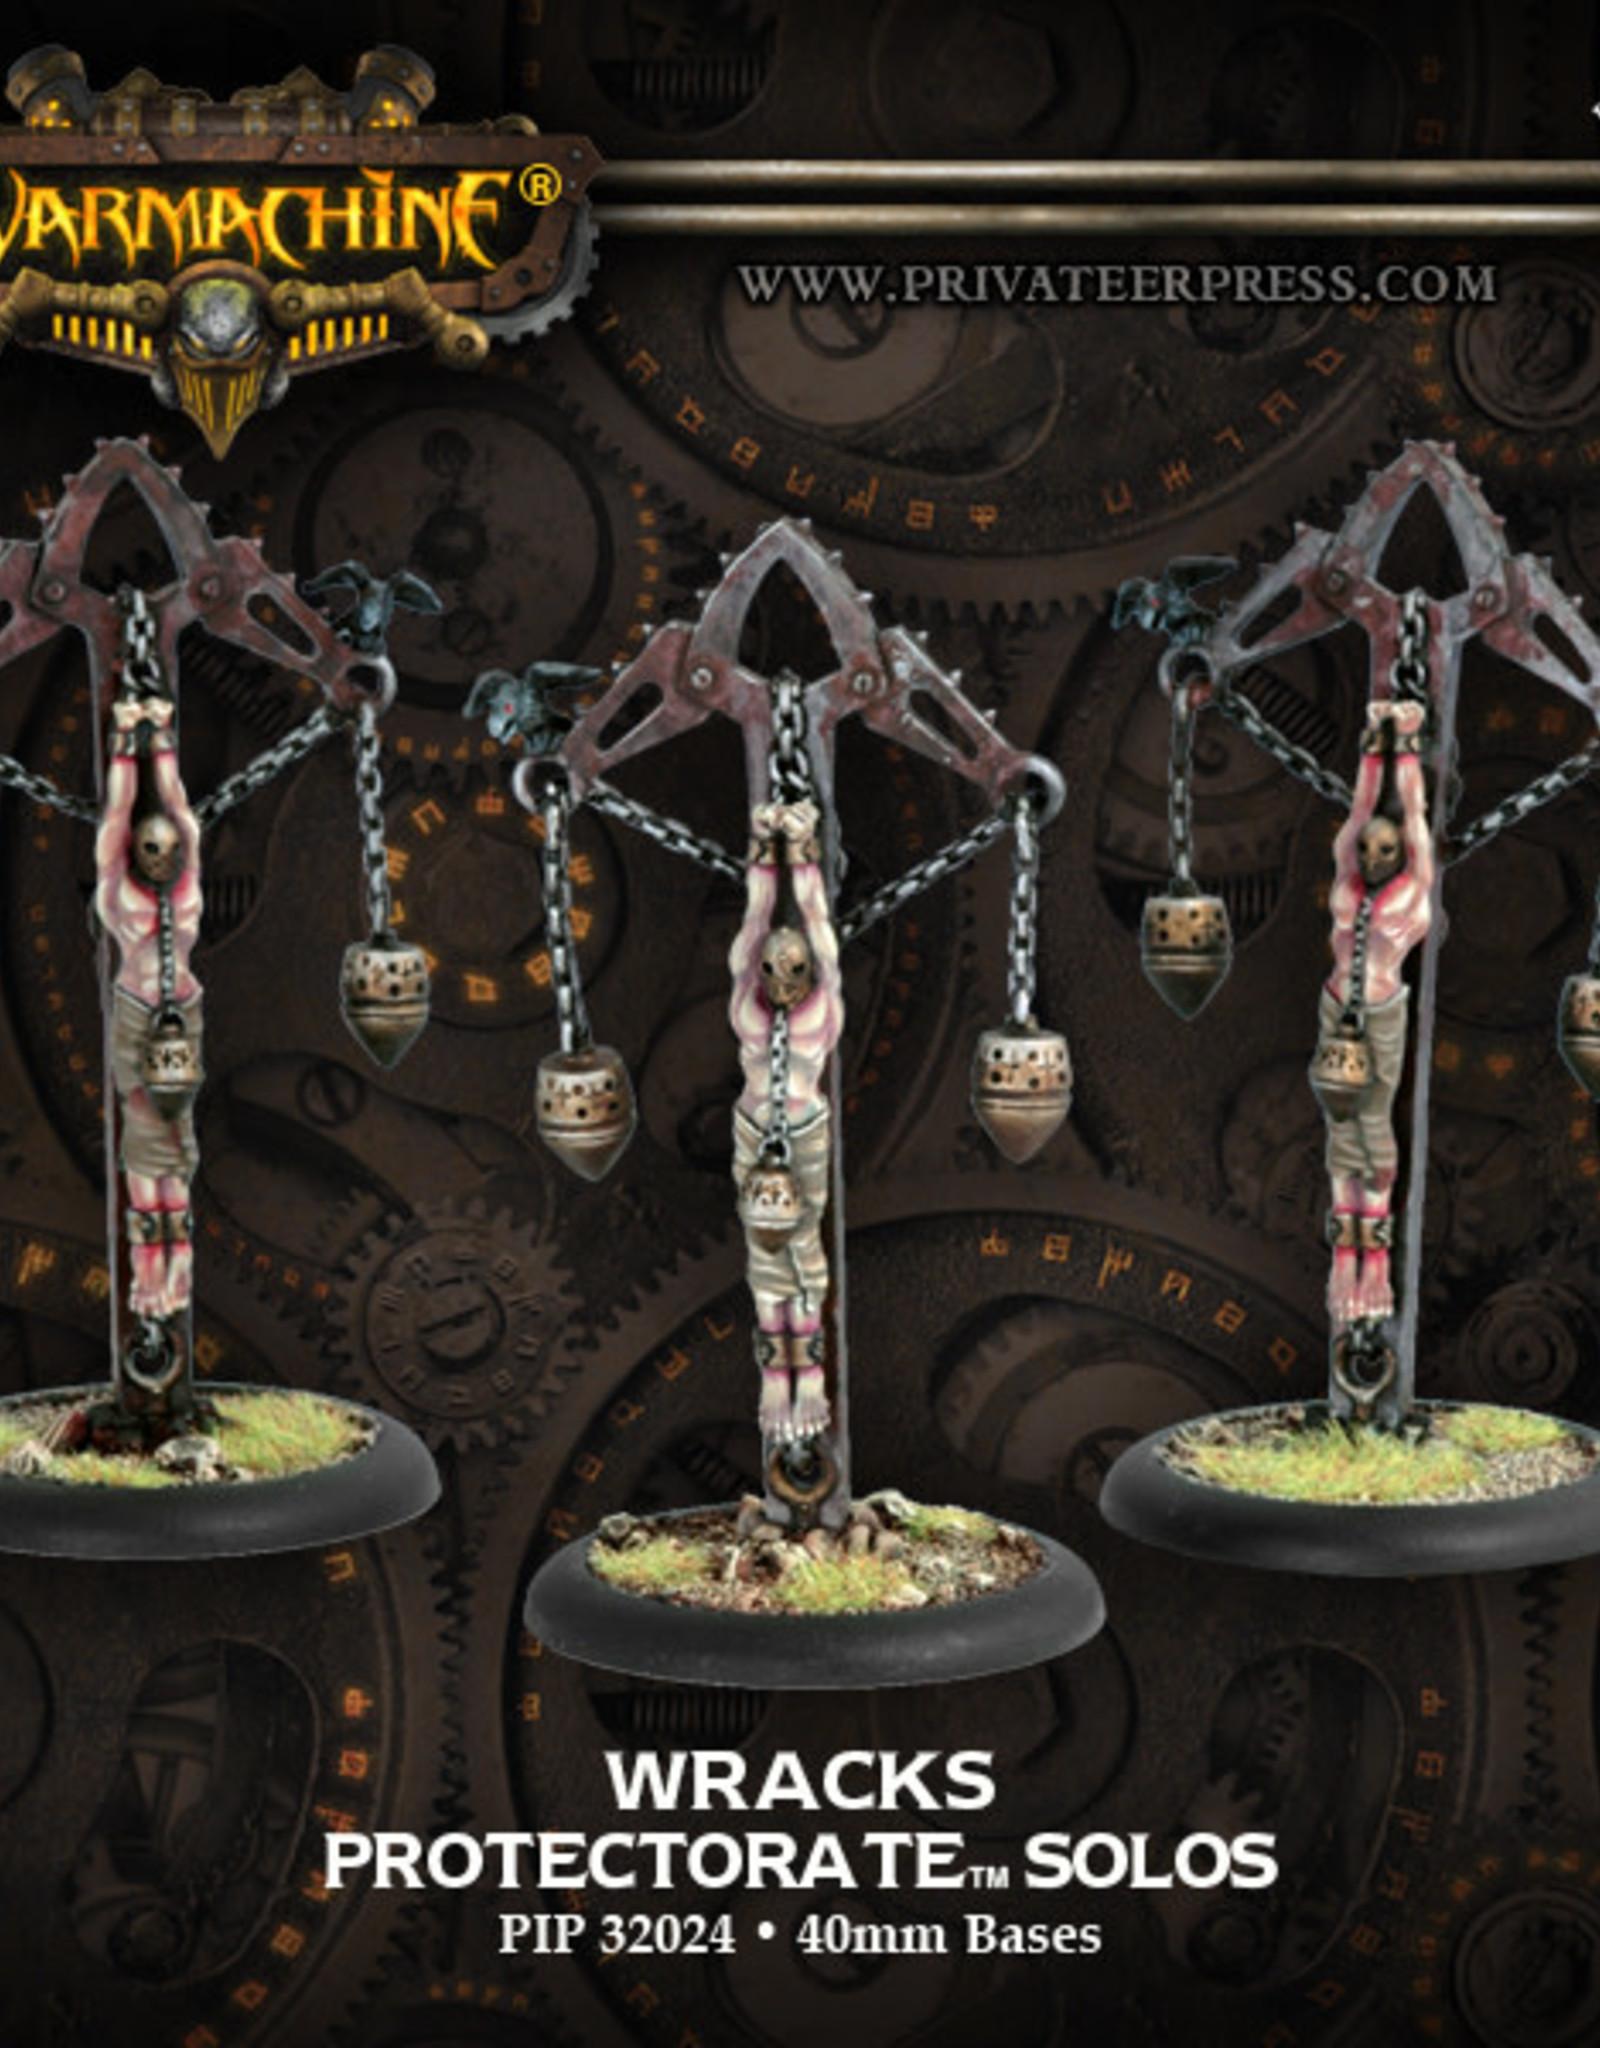 Warmachine Protectorate - Wracks